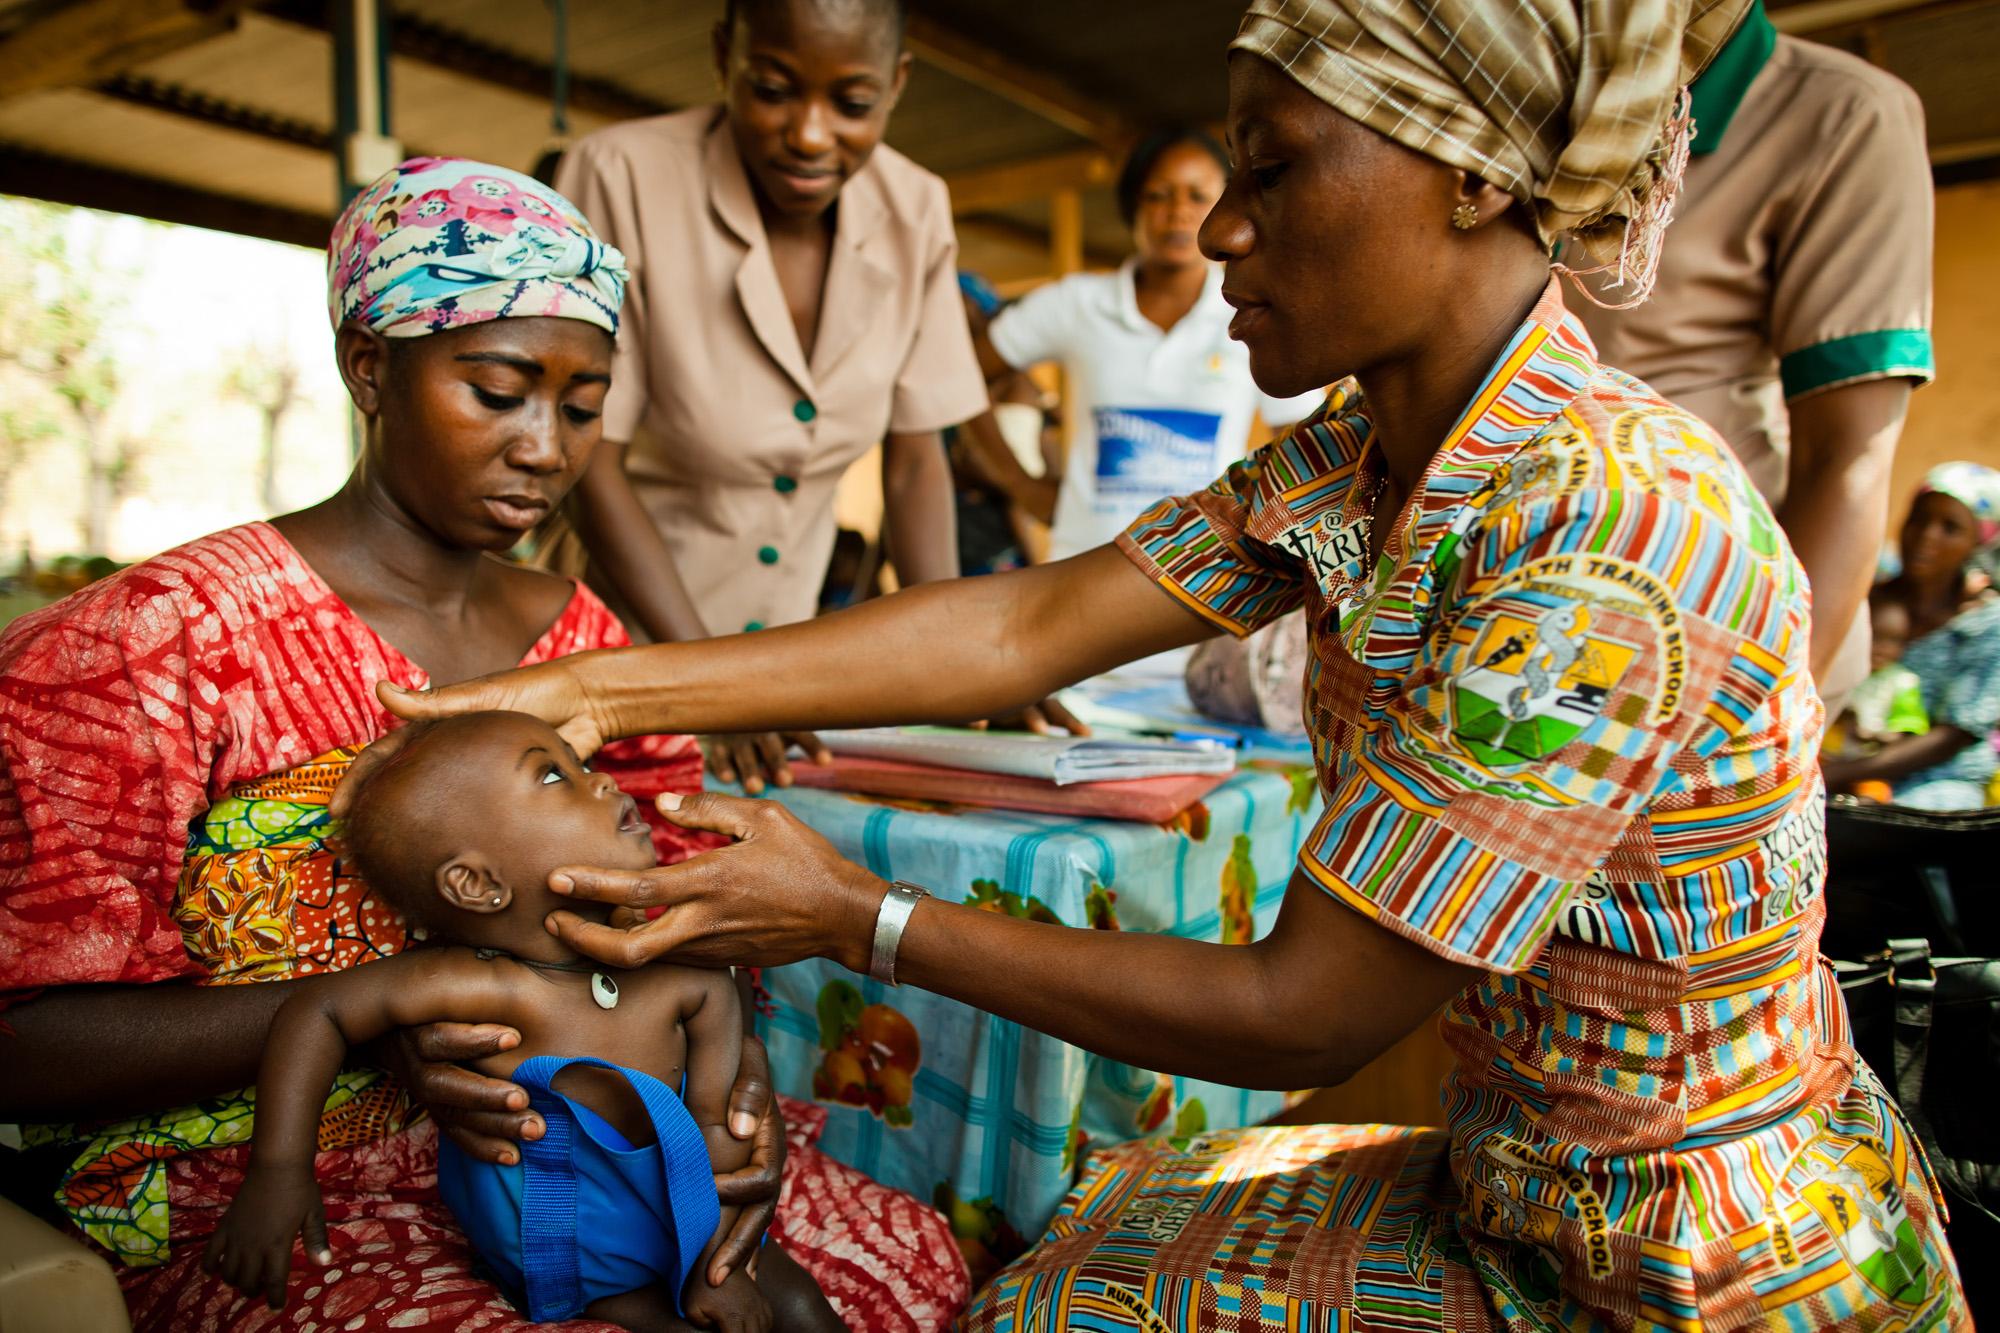 Malnutrition clinic in rural Ghana